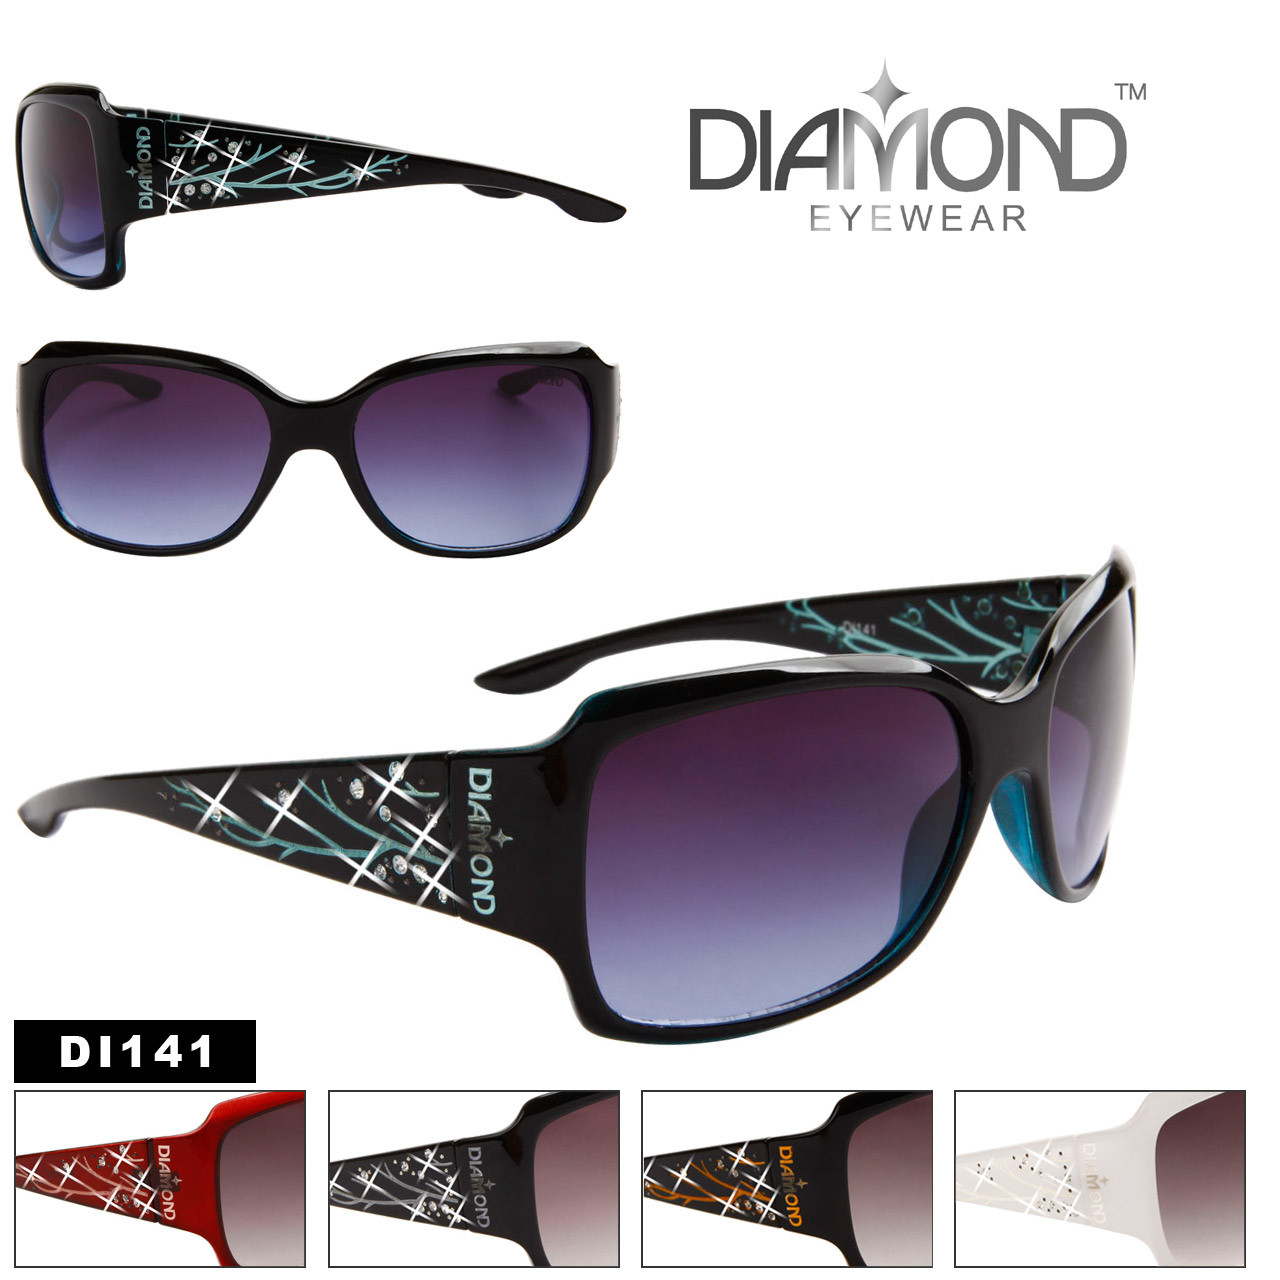 Women's Rhinestone Sunglasses - Diamond™ Eyewear - Style # DI141